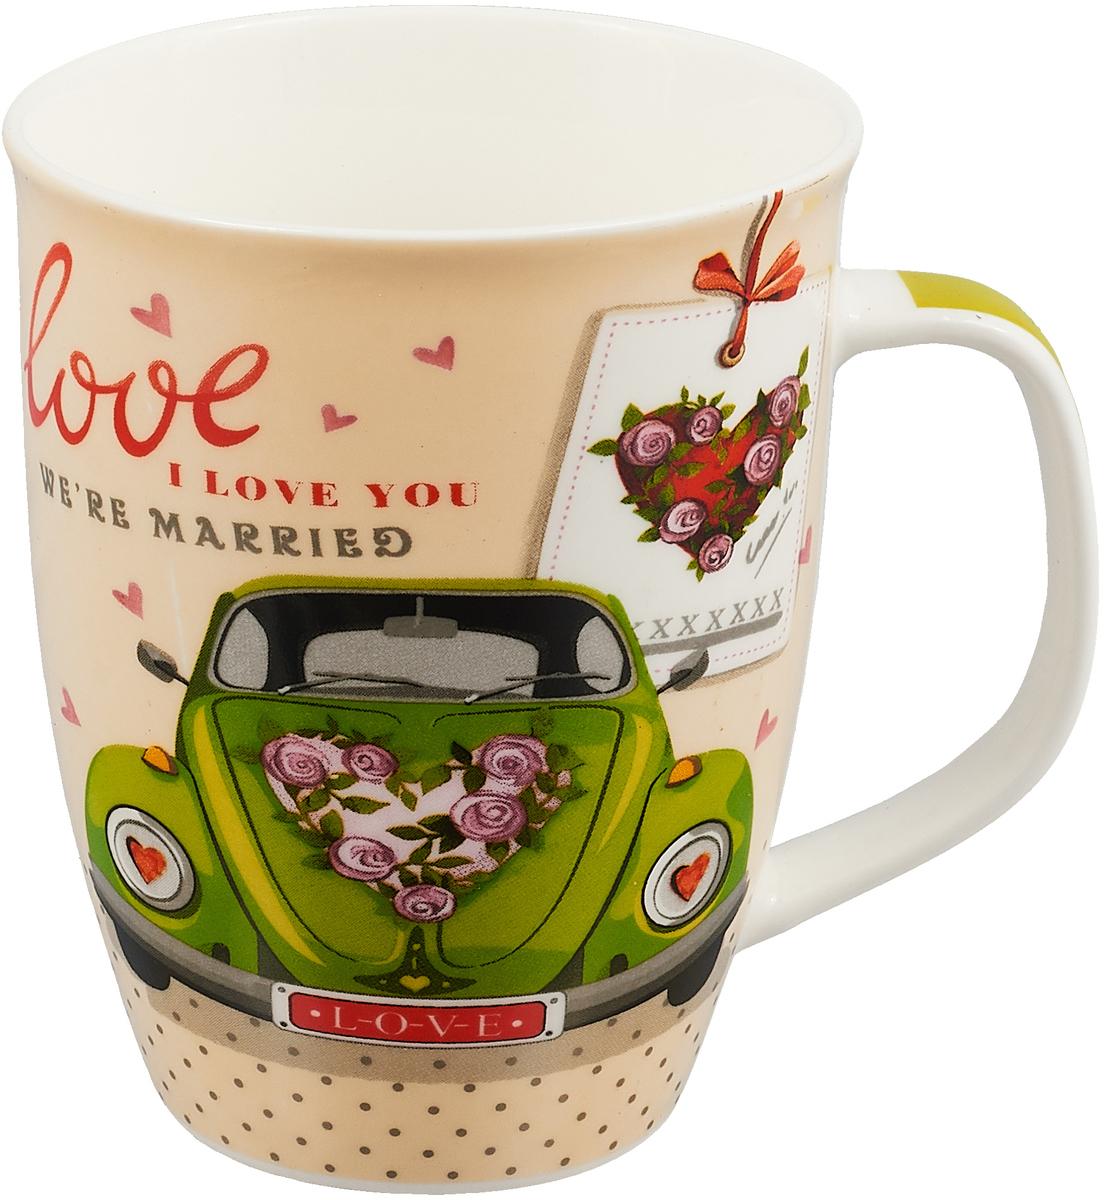 Кружка Loraine Love, цвет: песочный, зеленый, 340 мл. 25973 кружка loraine love 340 мл 25973 page 8